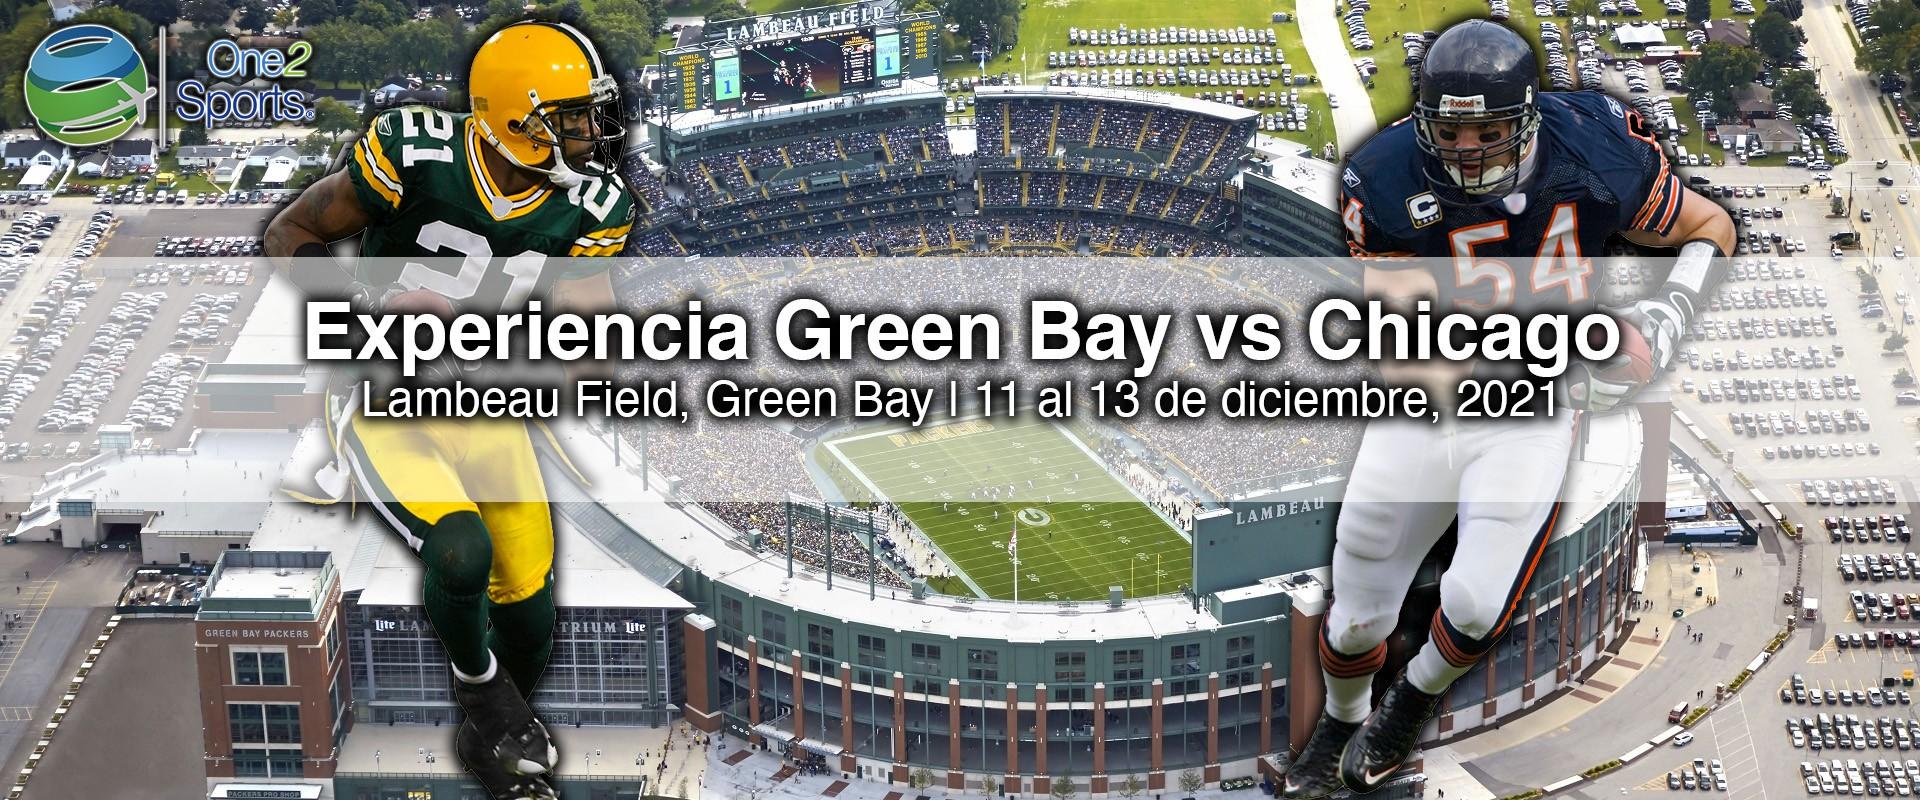 Green Bay vs Chicago